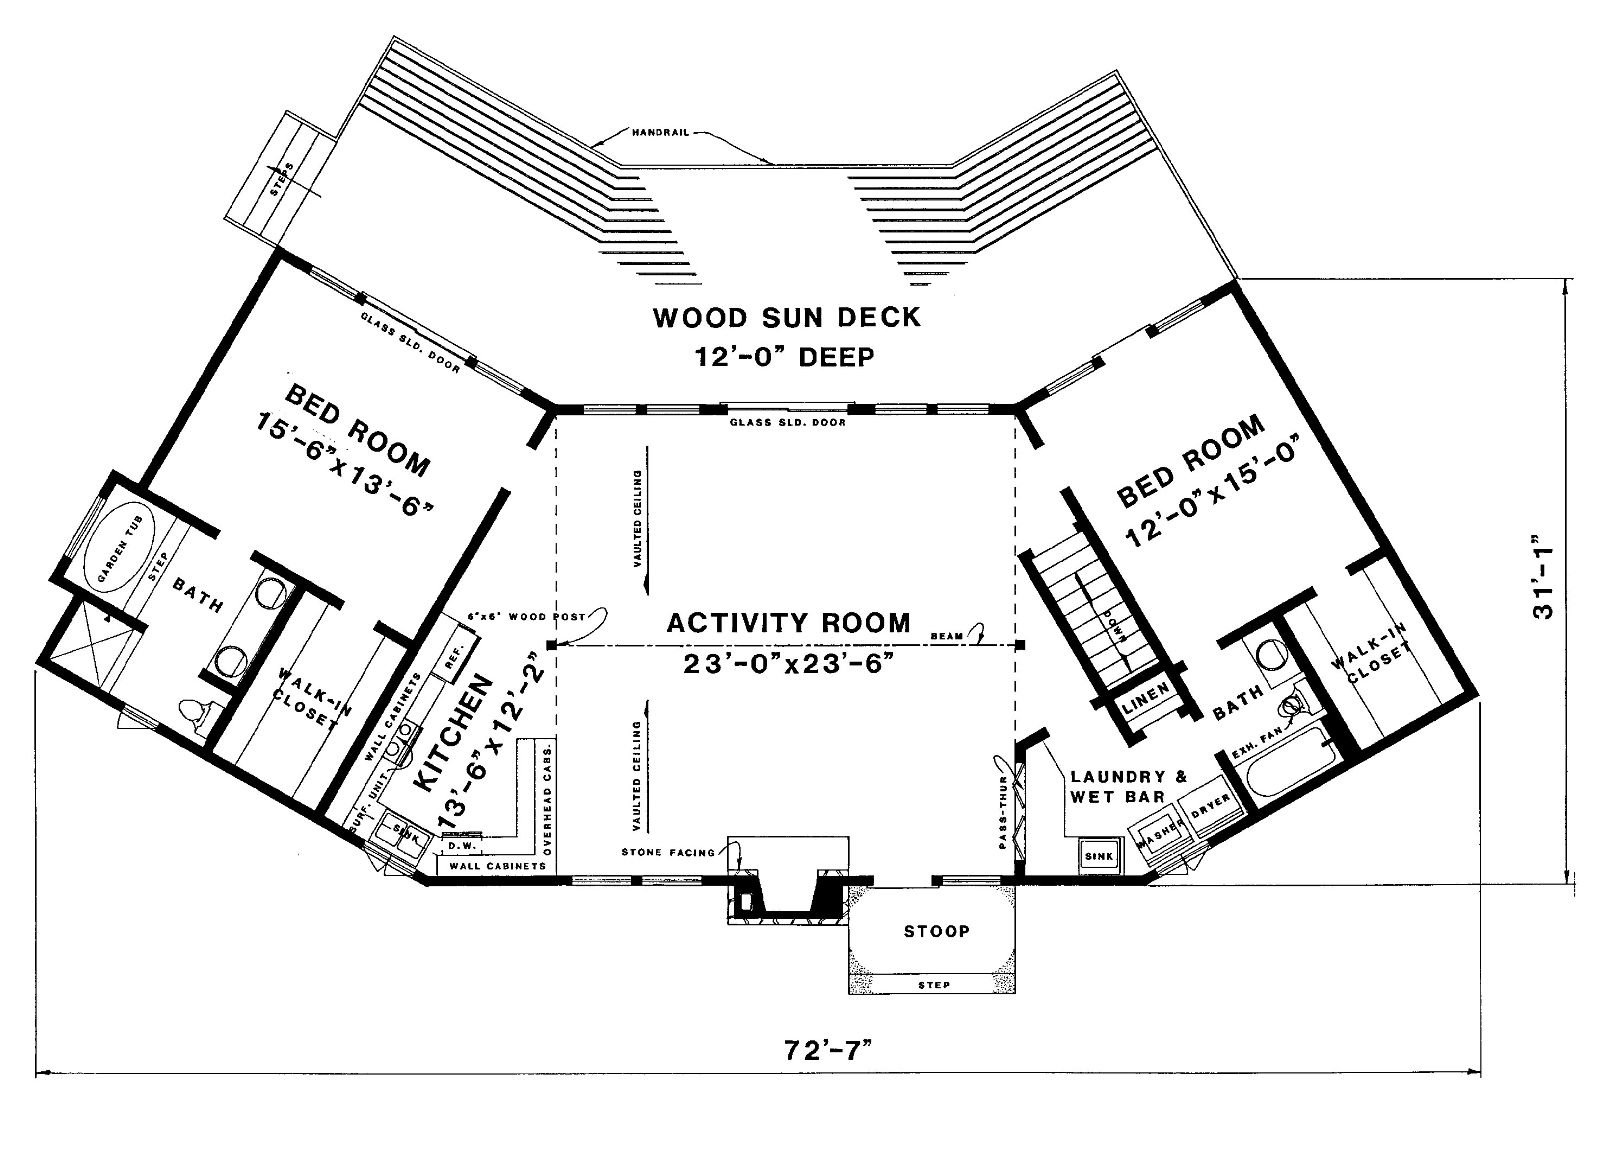 Beach House Plan   Bedrooms and   Baths   Plan st floor plan